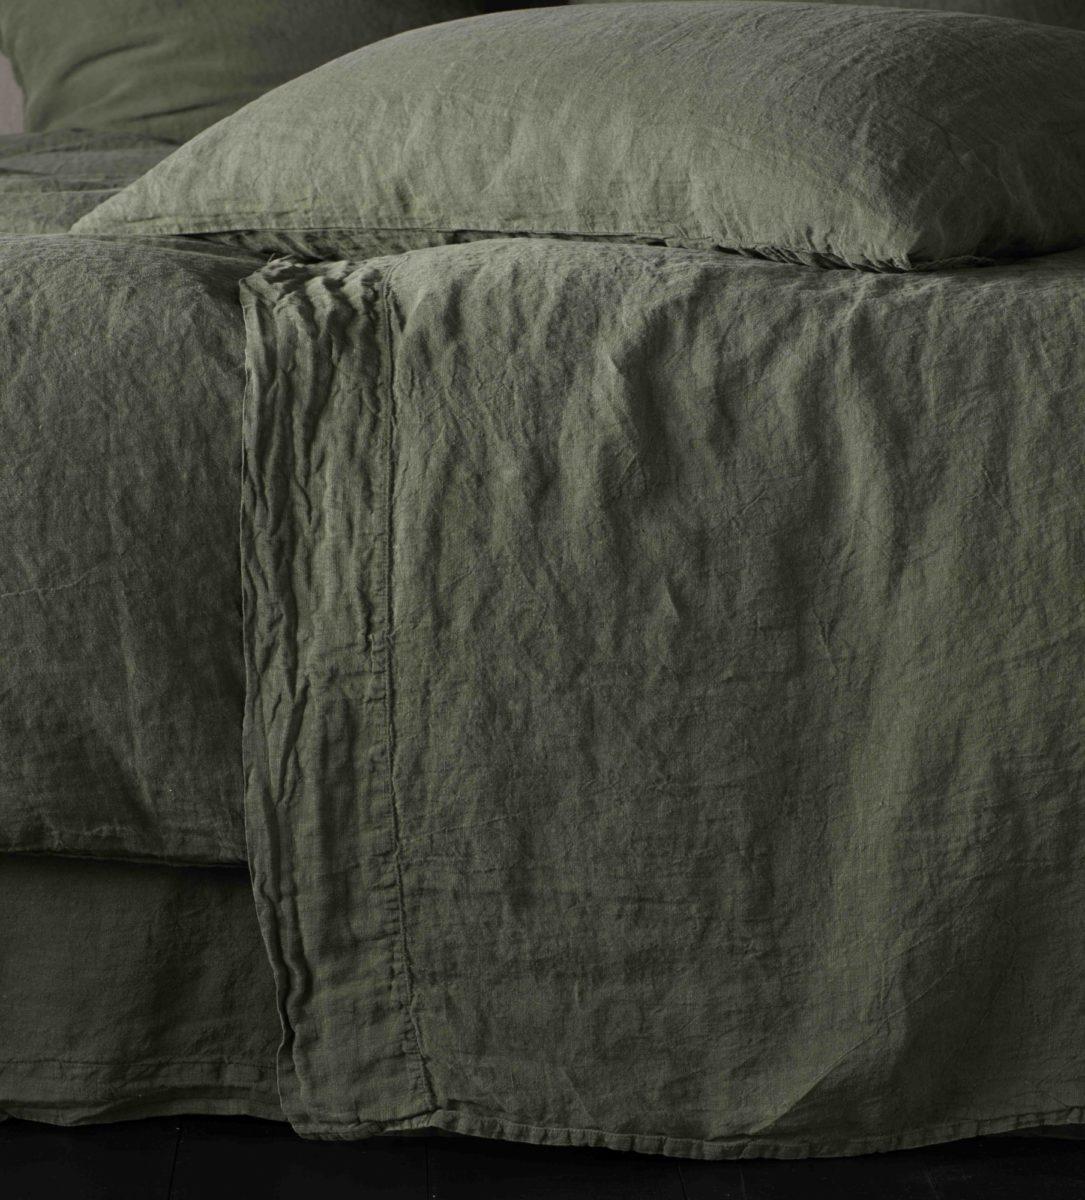 Olive Green 100 Linen Bed Sheets Secret Linen Store